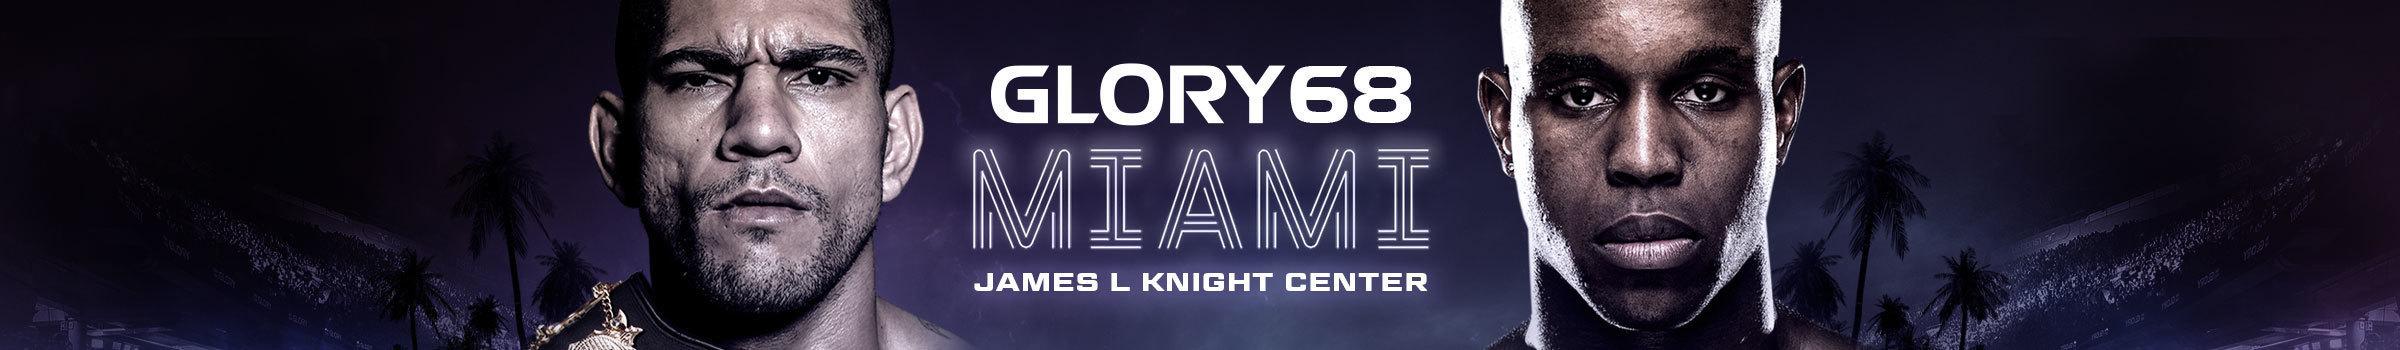 GLORY 68 Miami